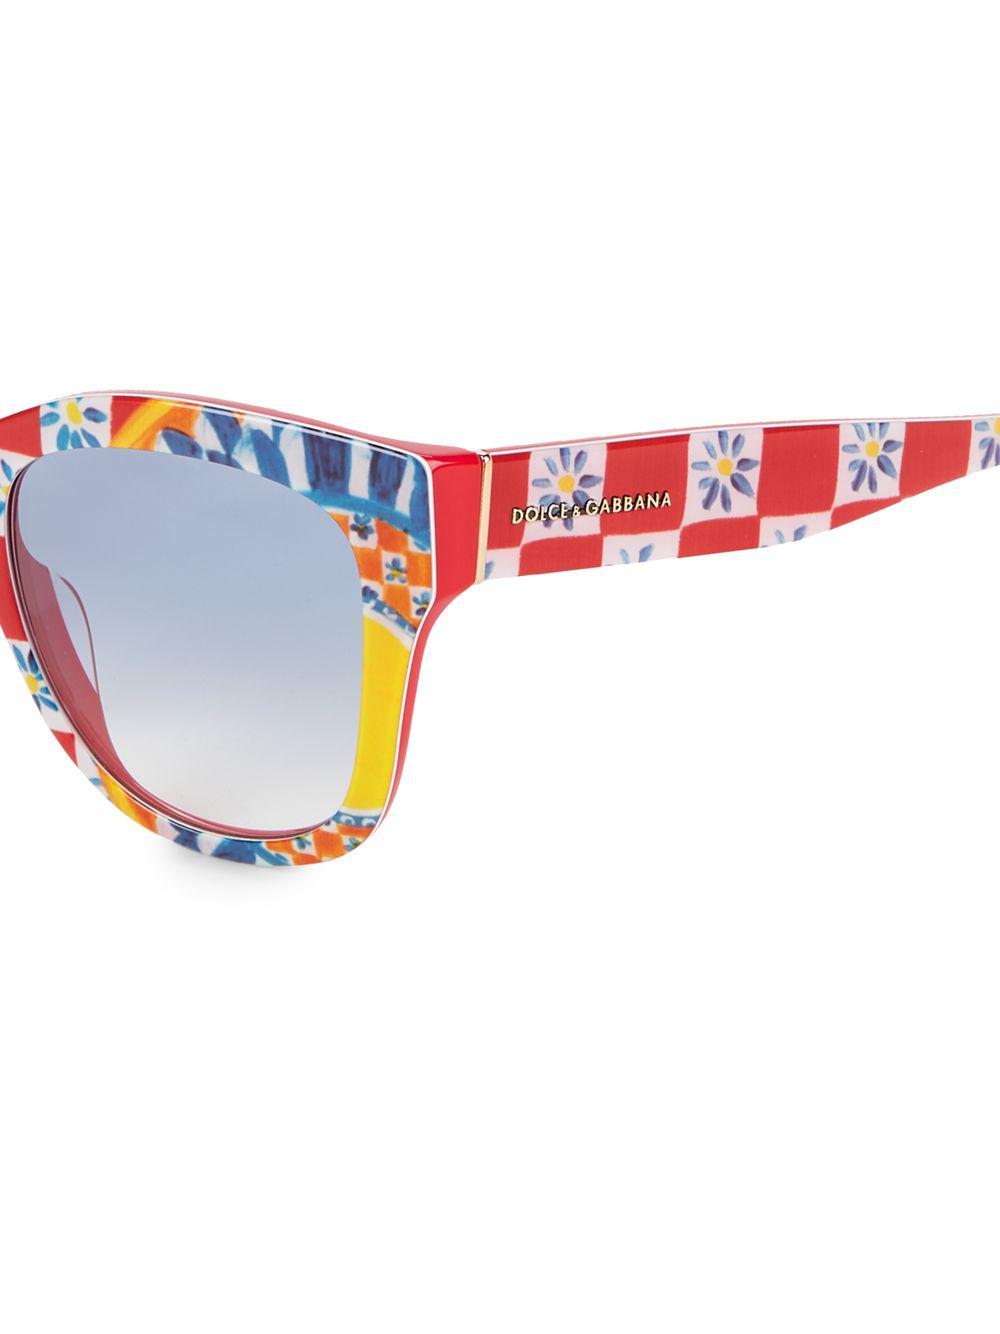 e6539a677b4 Dolce   Gabbana - Blue 55mm Floral Tile Print Square Sunglasses - Lyst.  View fullscreen